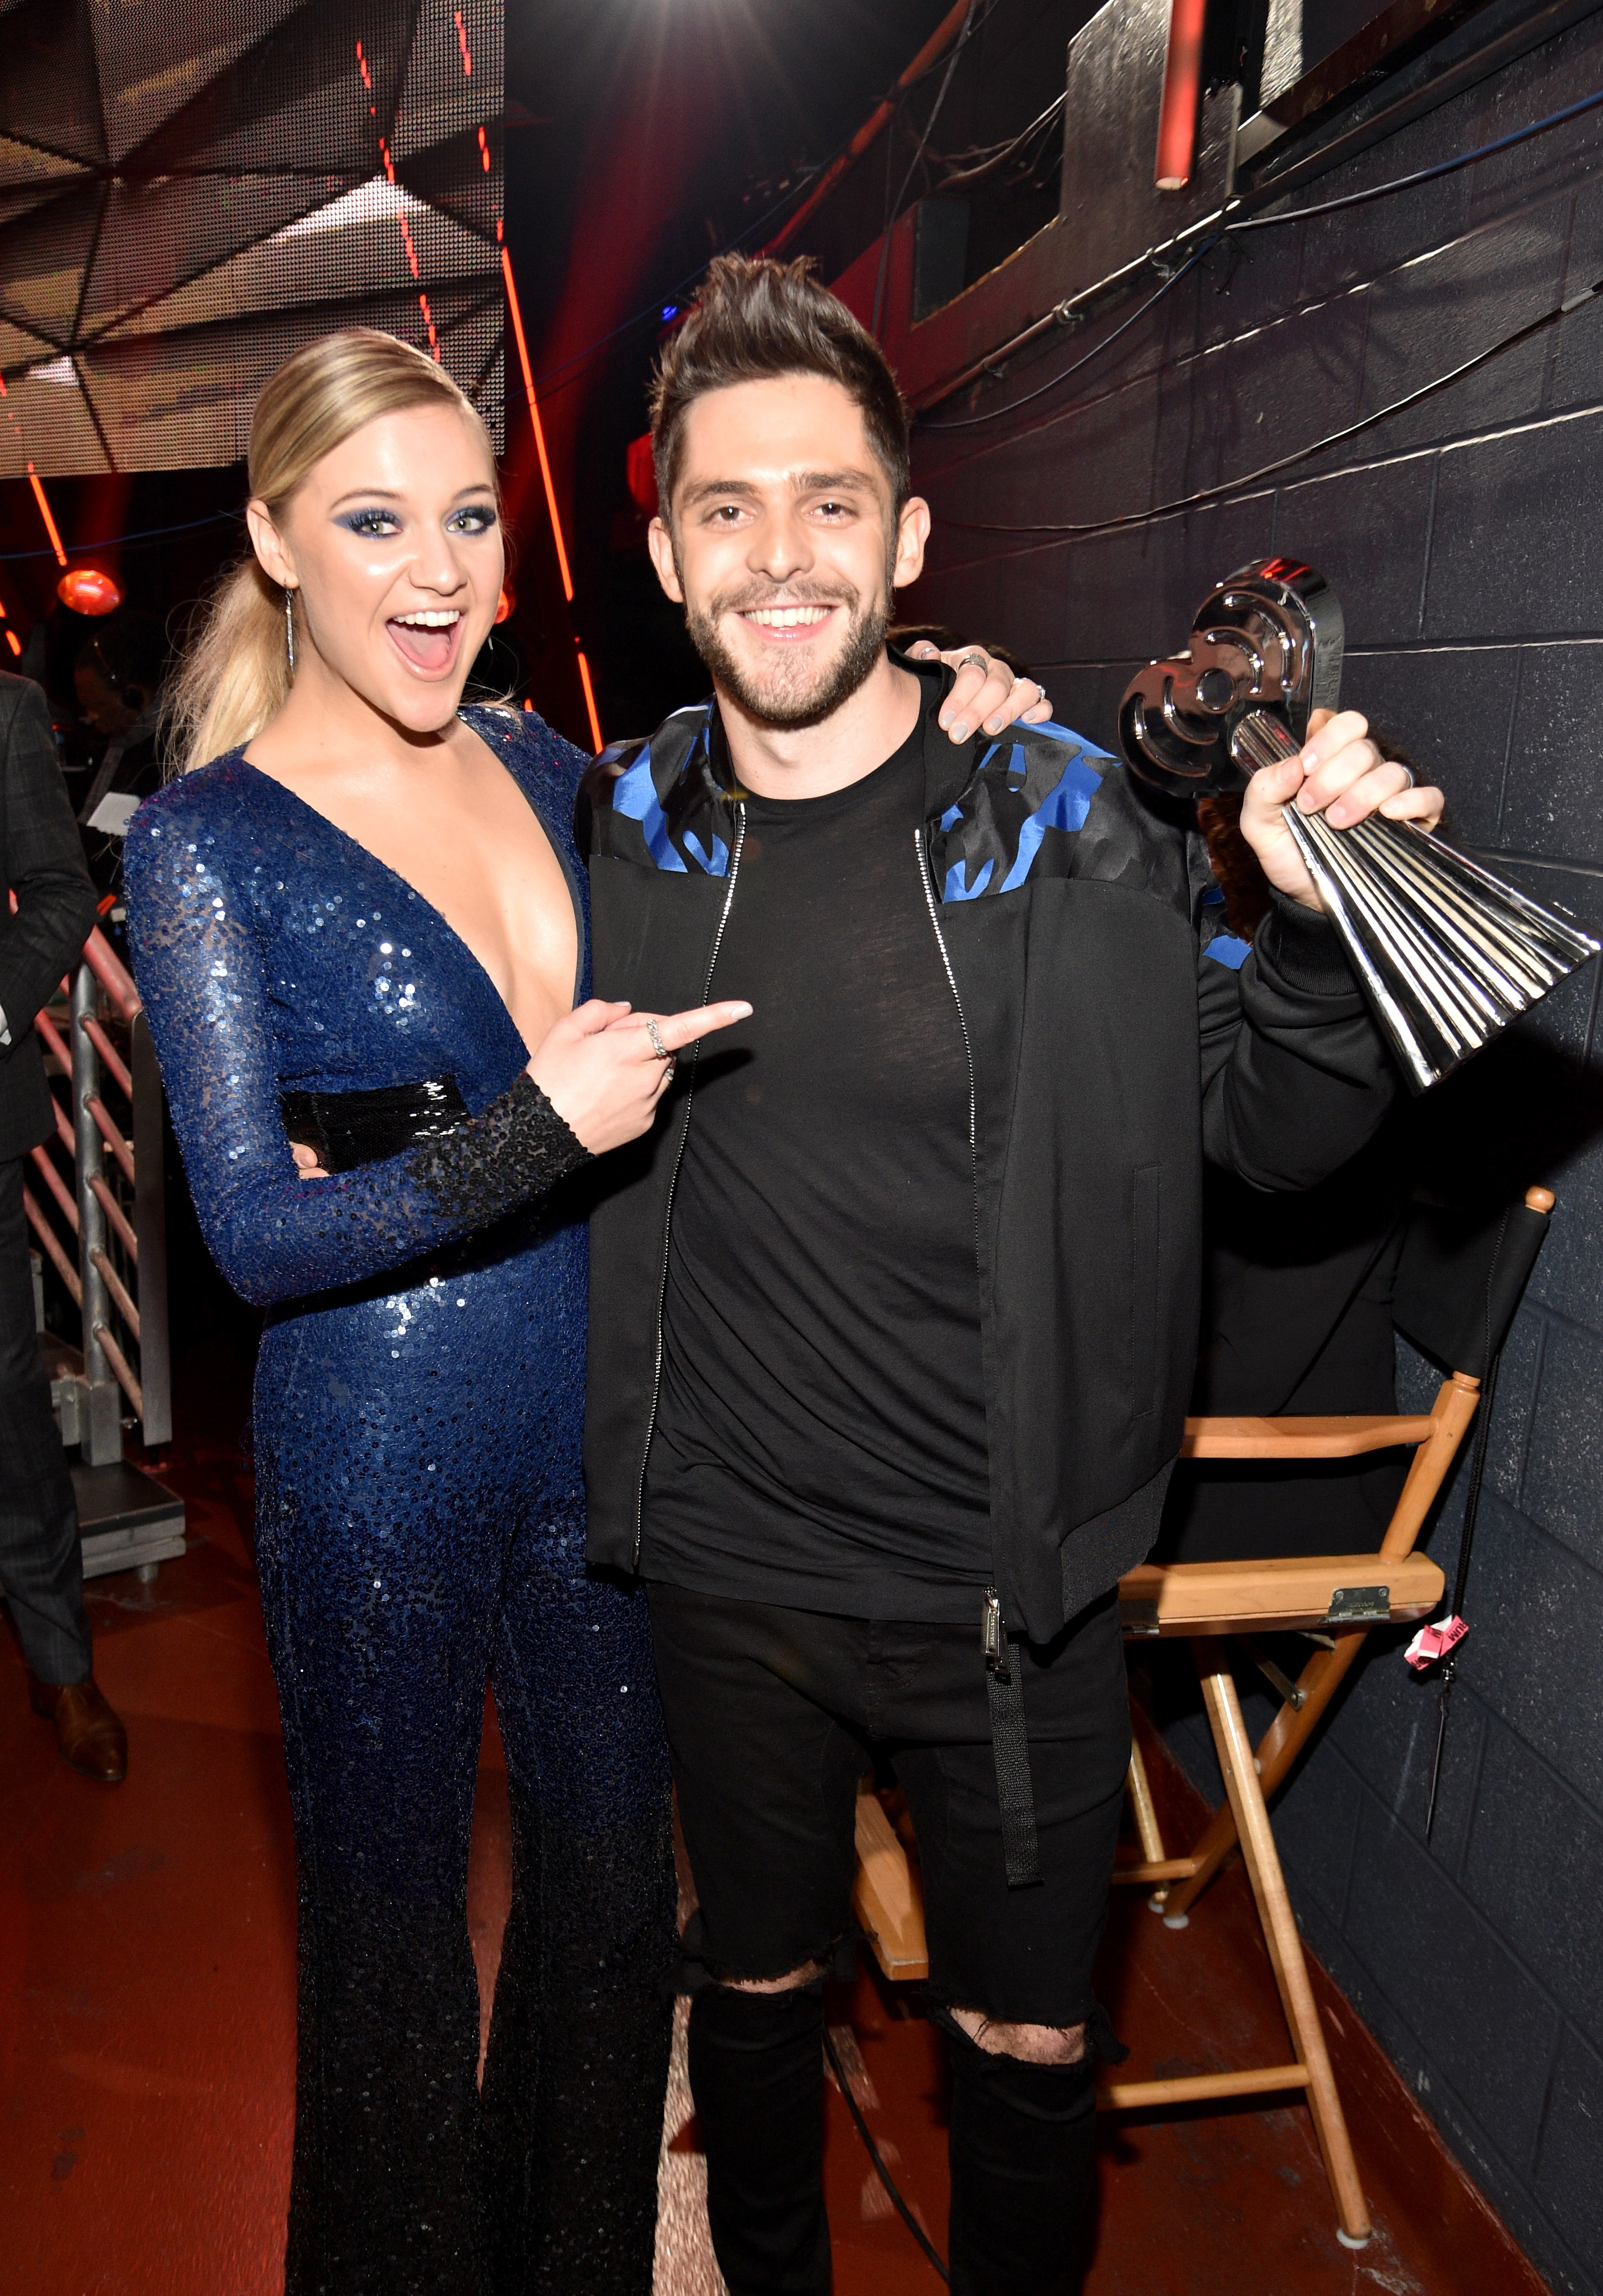 Thomas Rhett Kelsea Ballerini To Co Host 201 News Megacountry